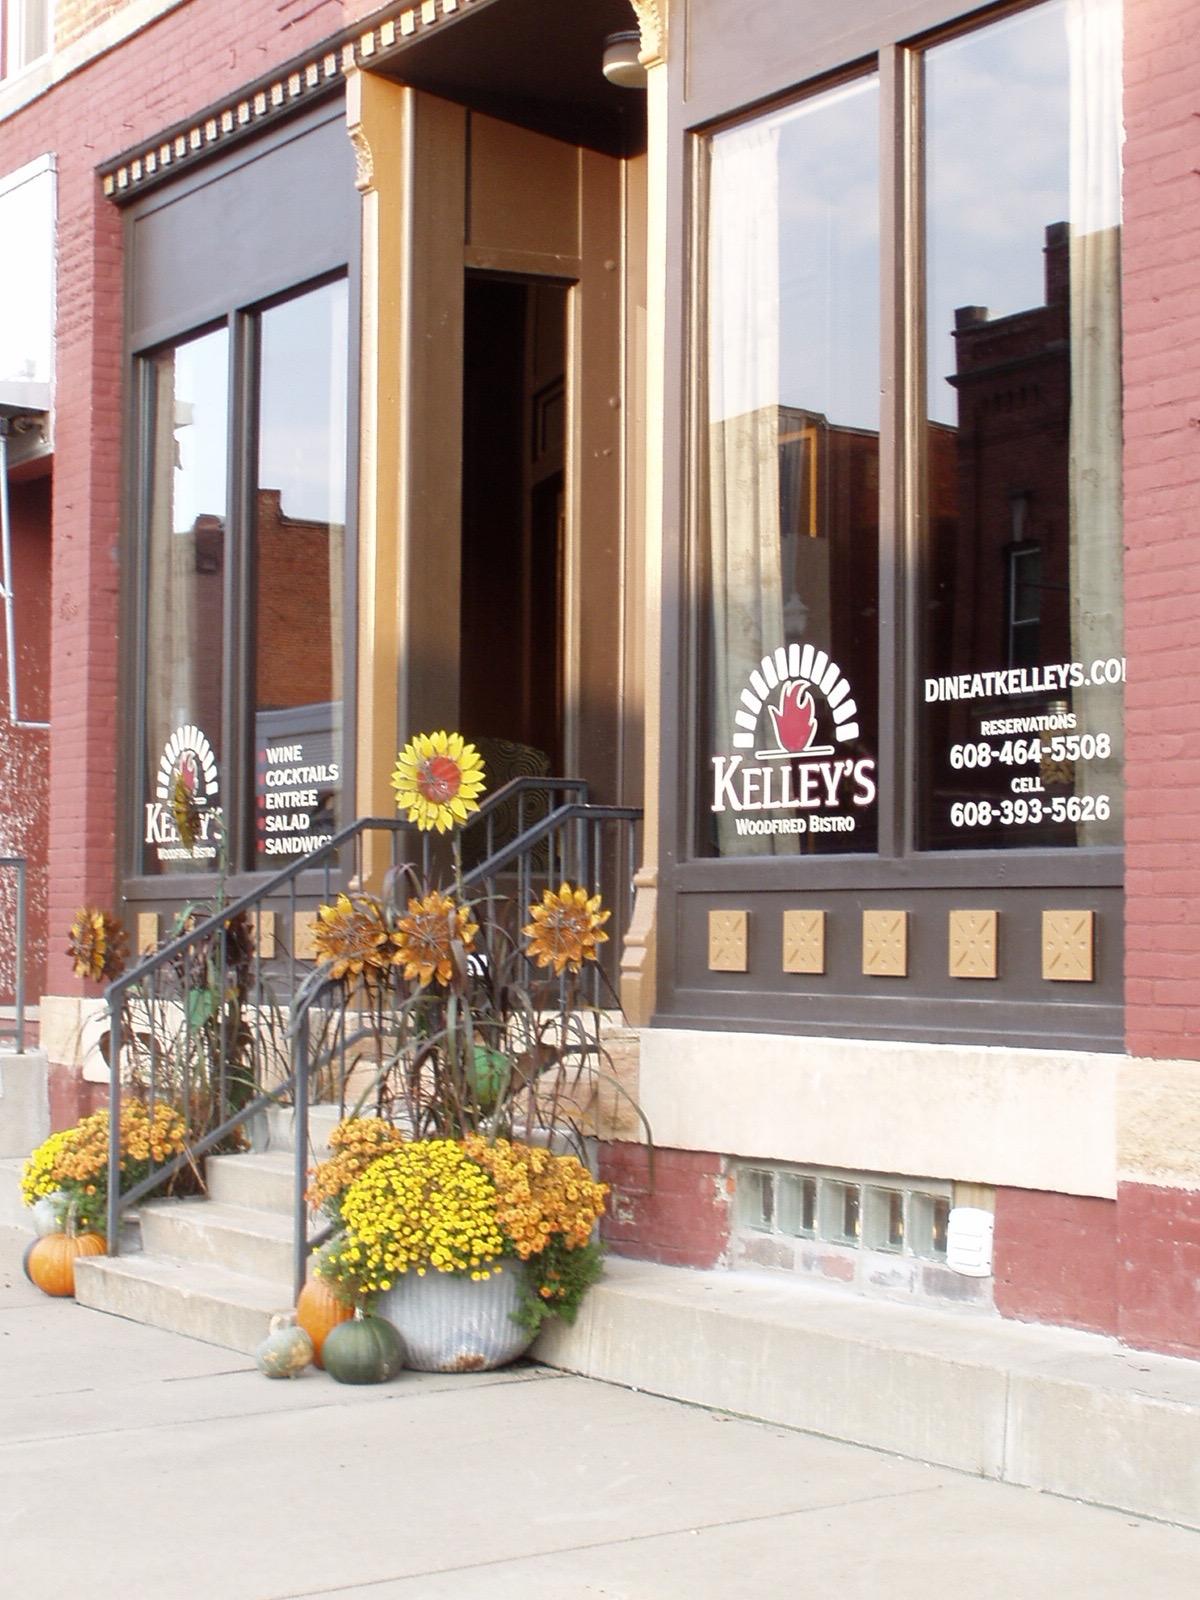 206 center street bid4dirt wisconsin real estate solutioingenieria Gallery